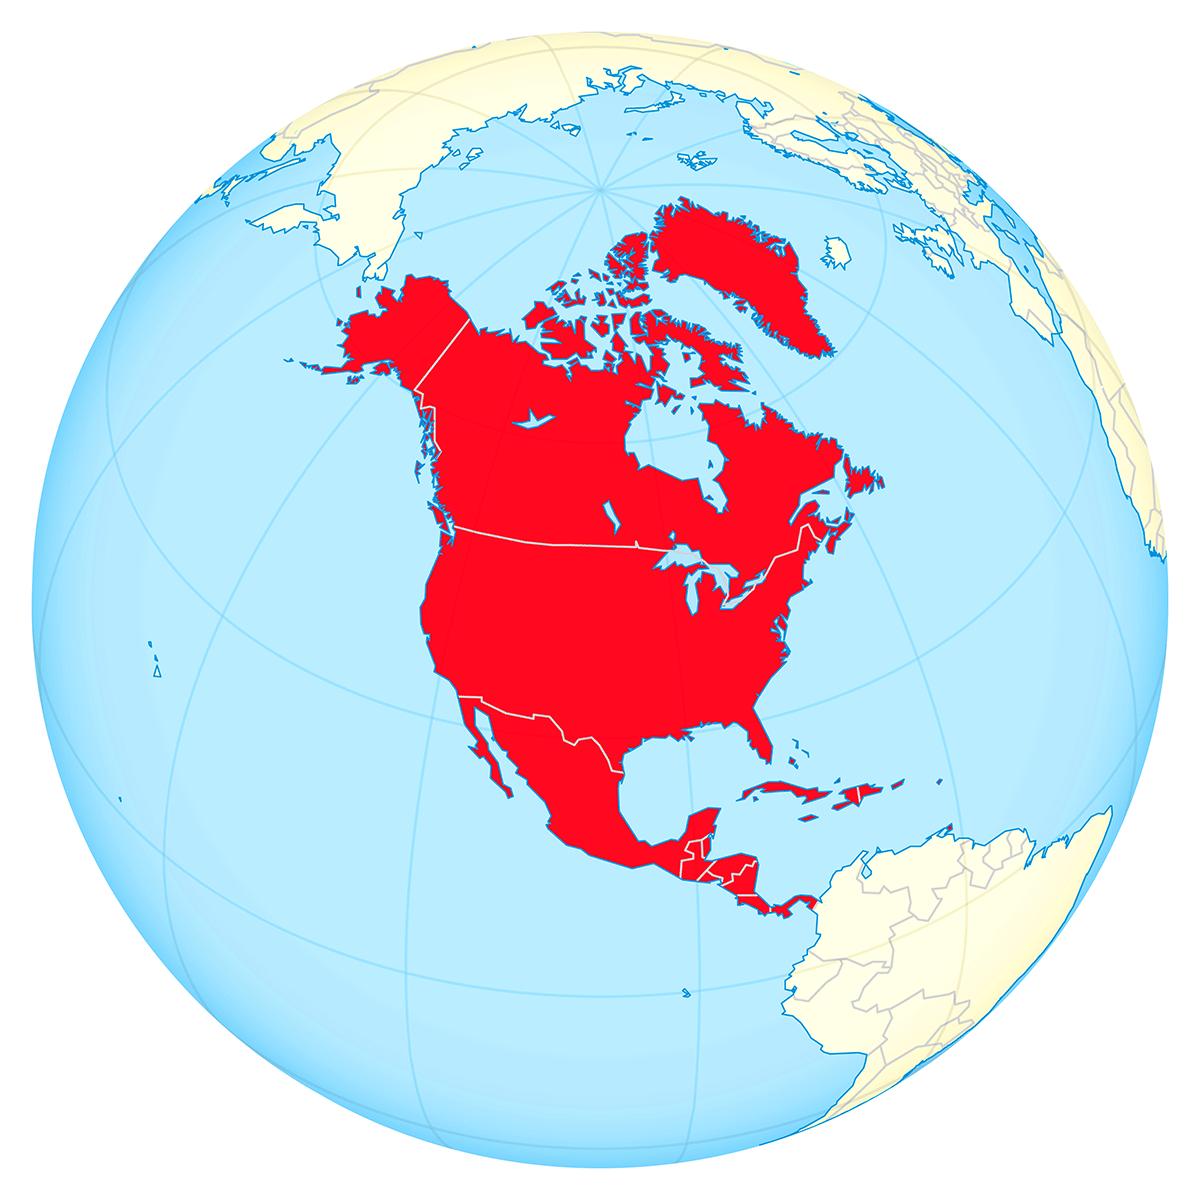 North America locator map